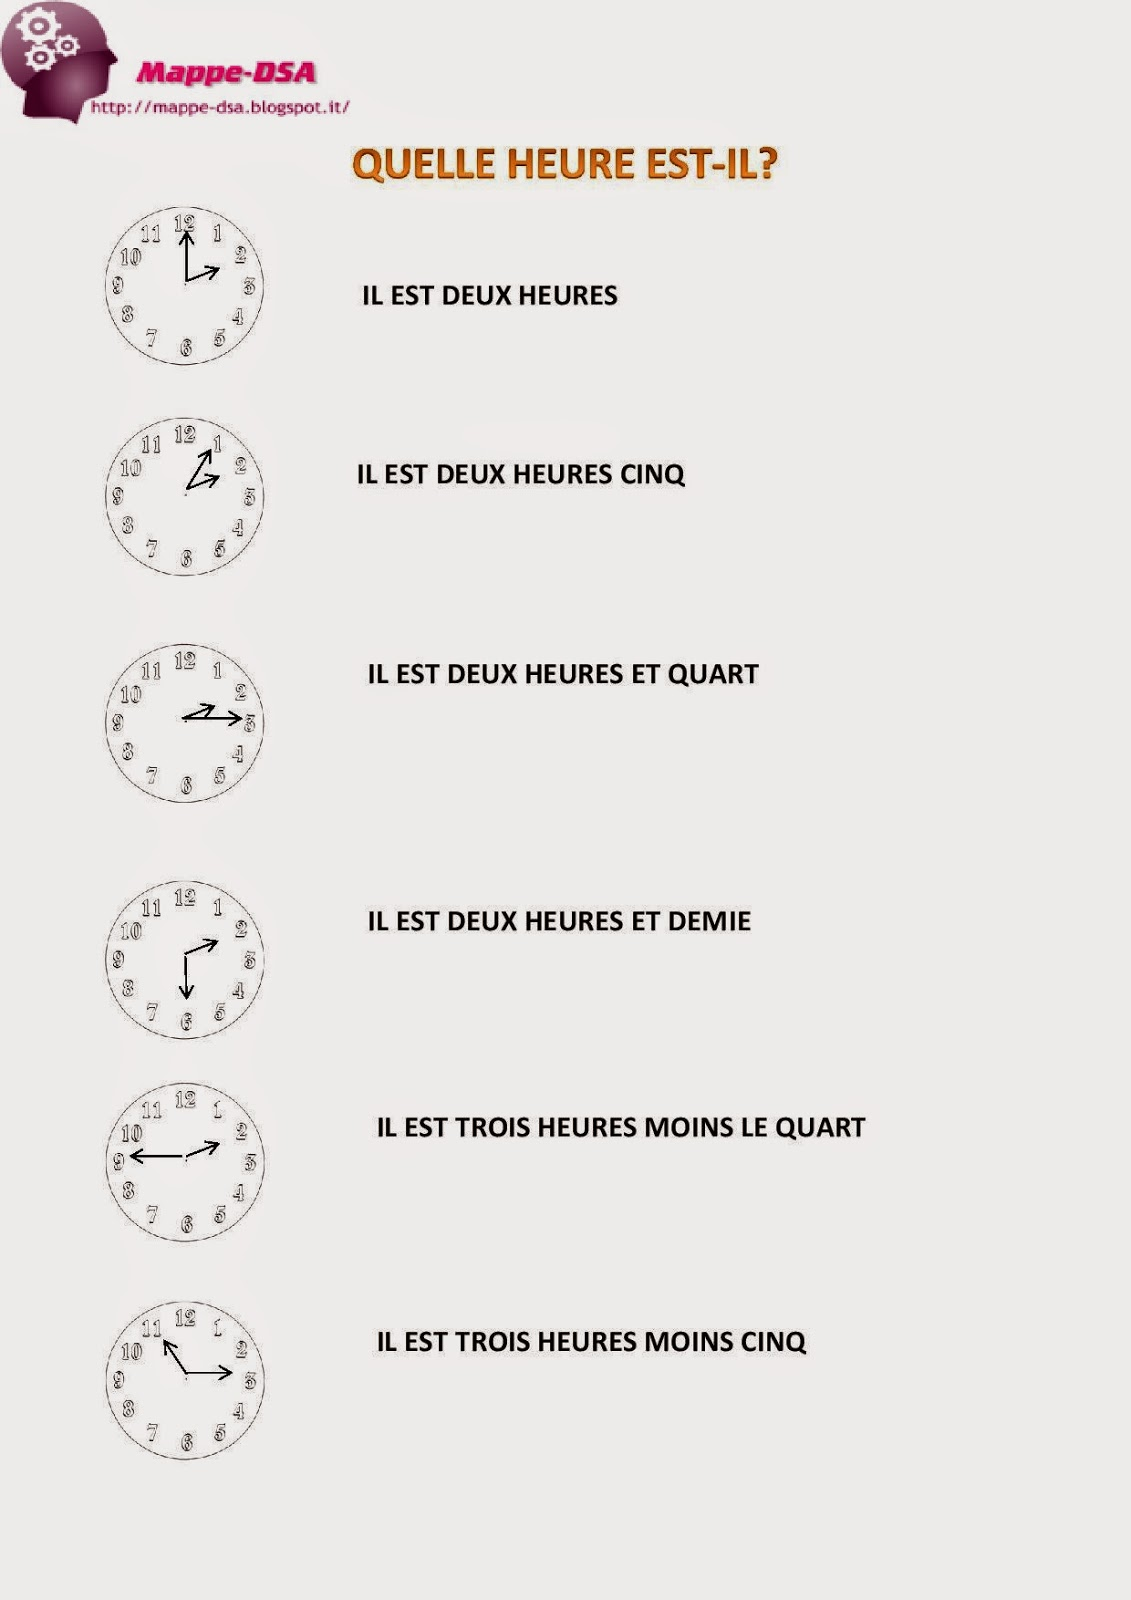 mappa dsa schema ore francese quelle heure est il?